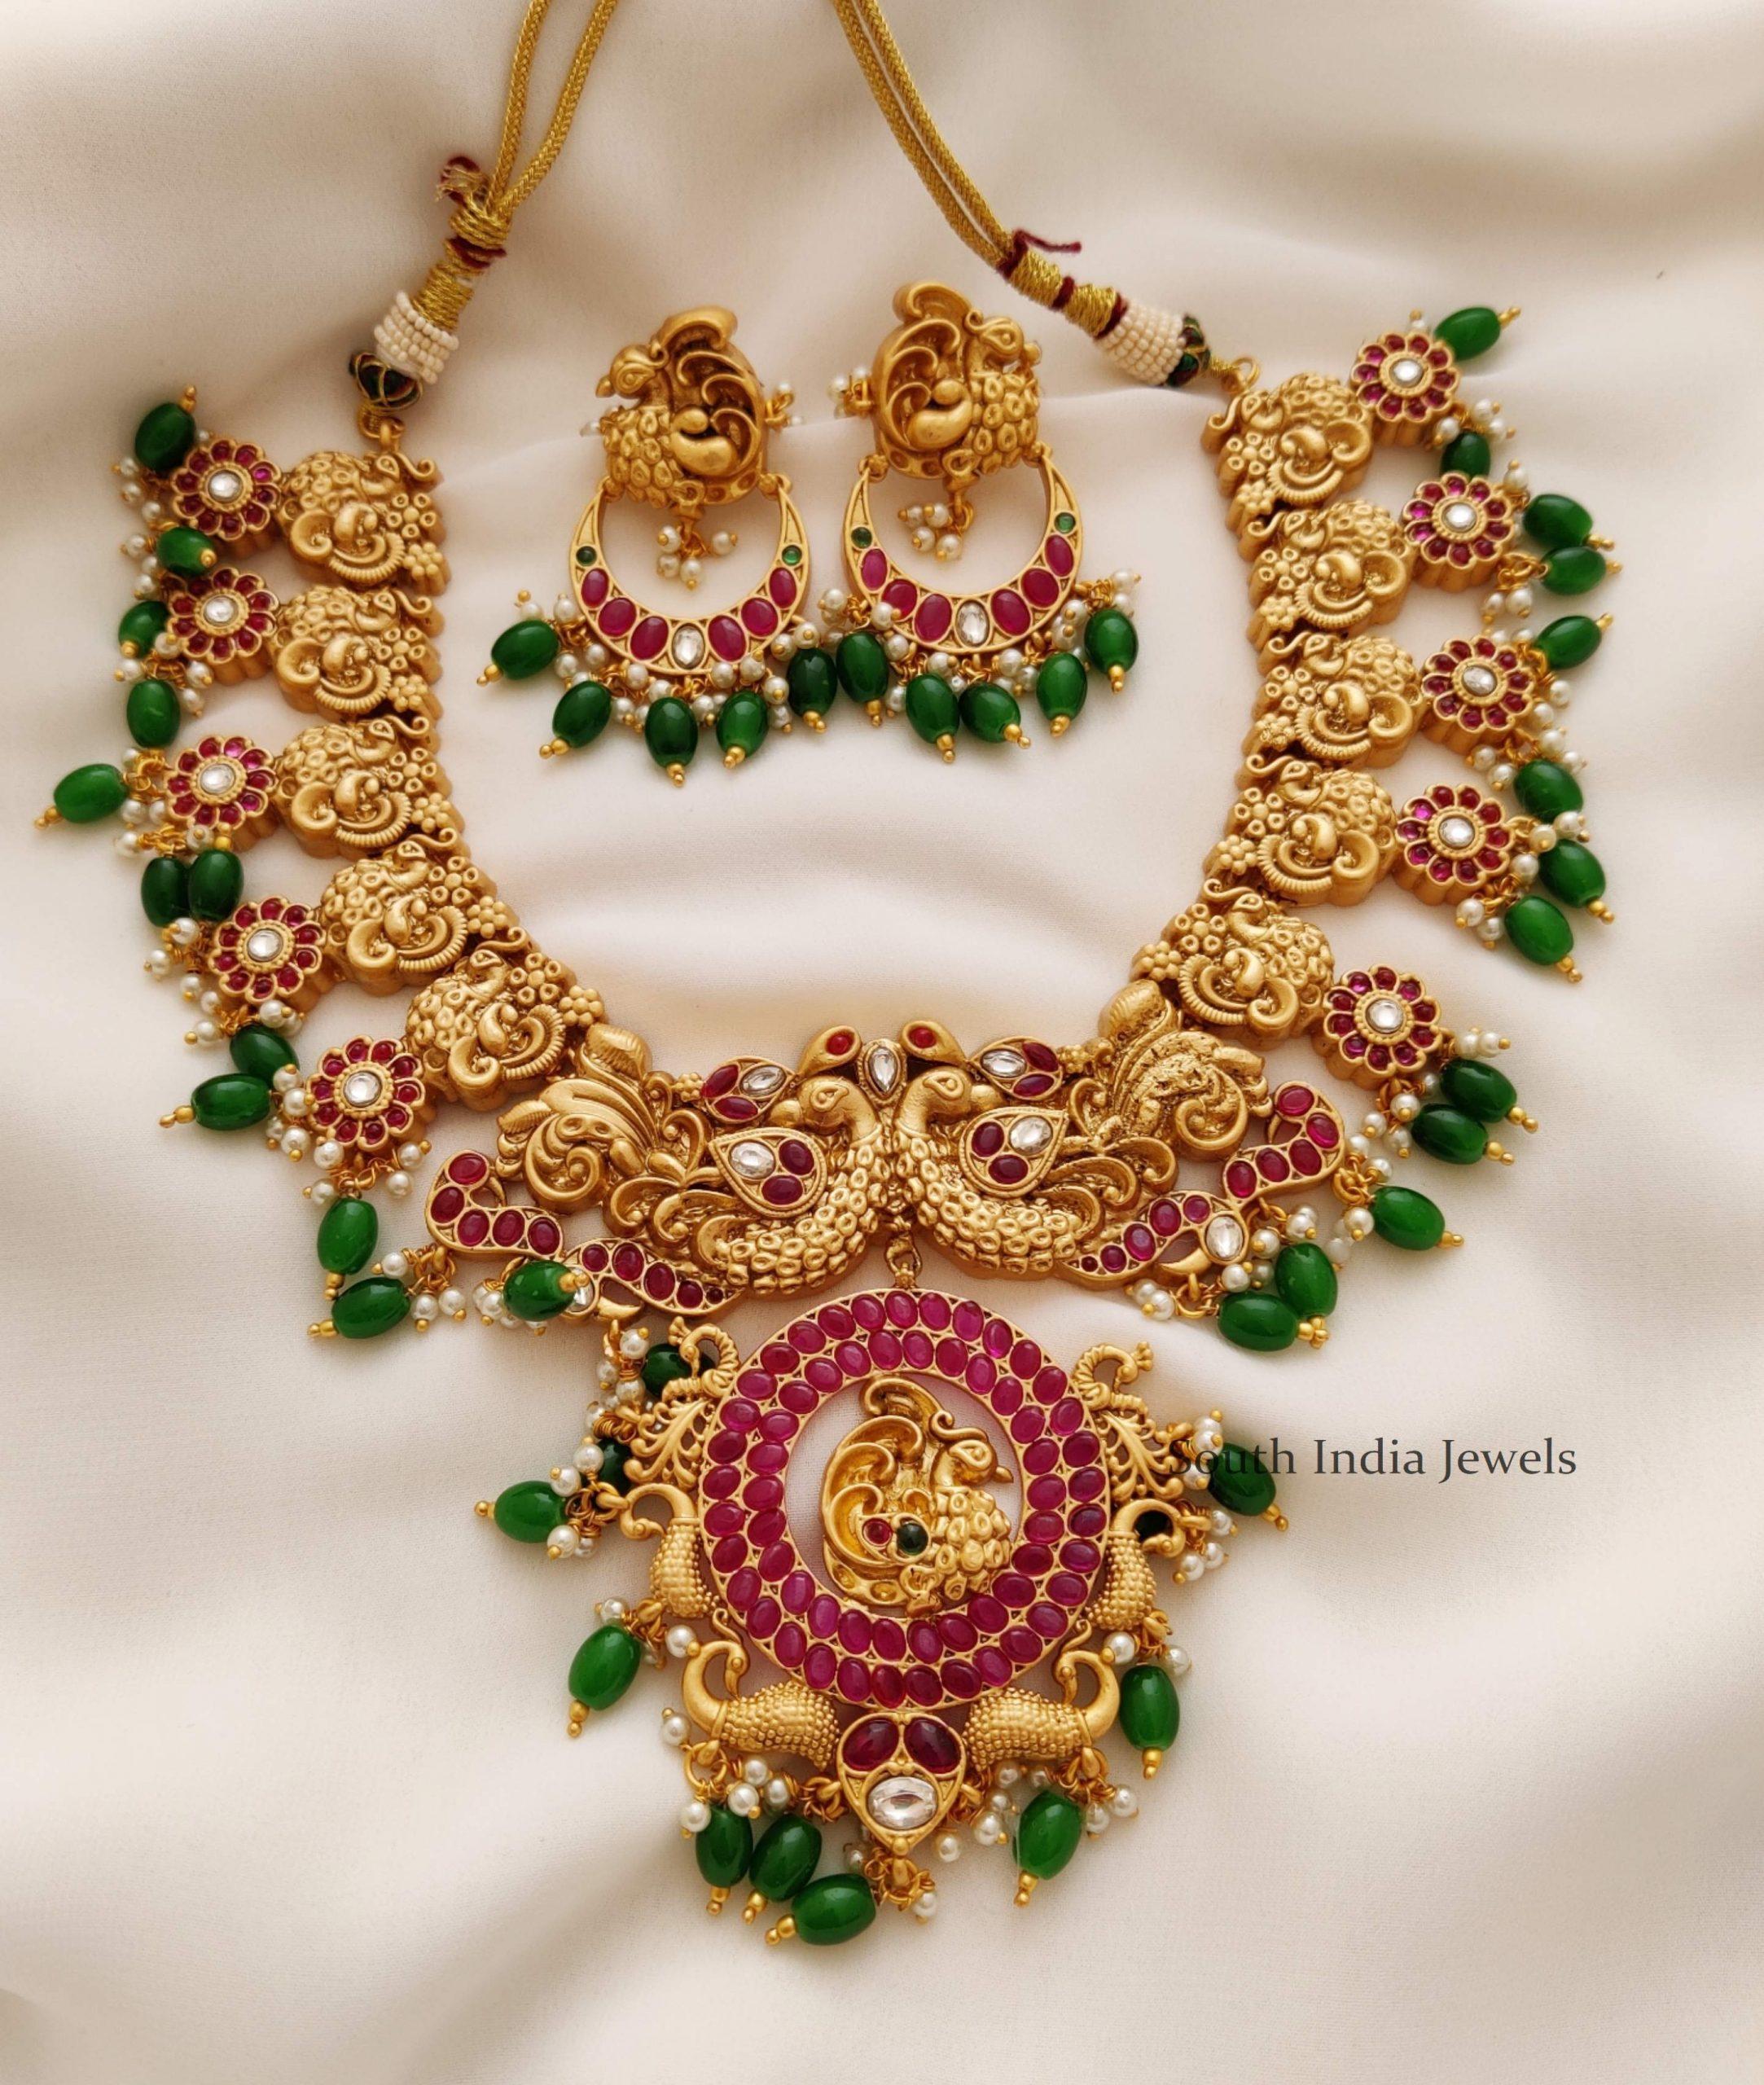 Amazing-Peacock-Design-Necklace